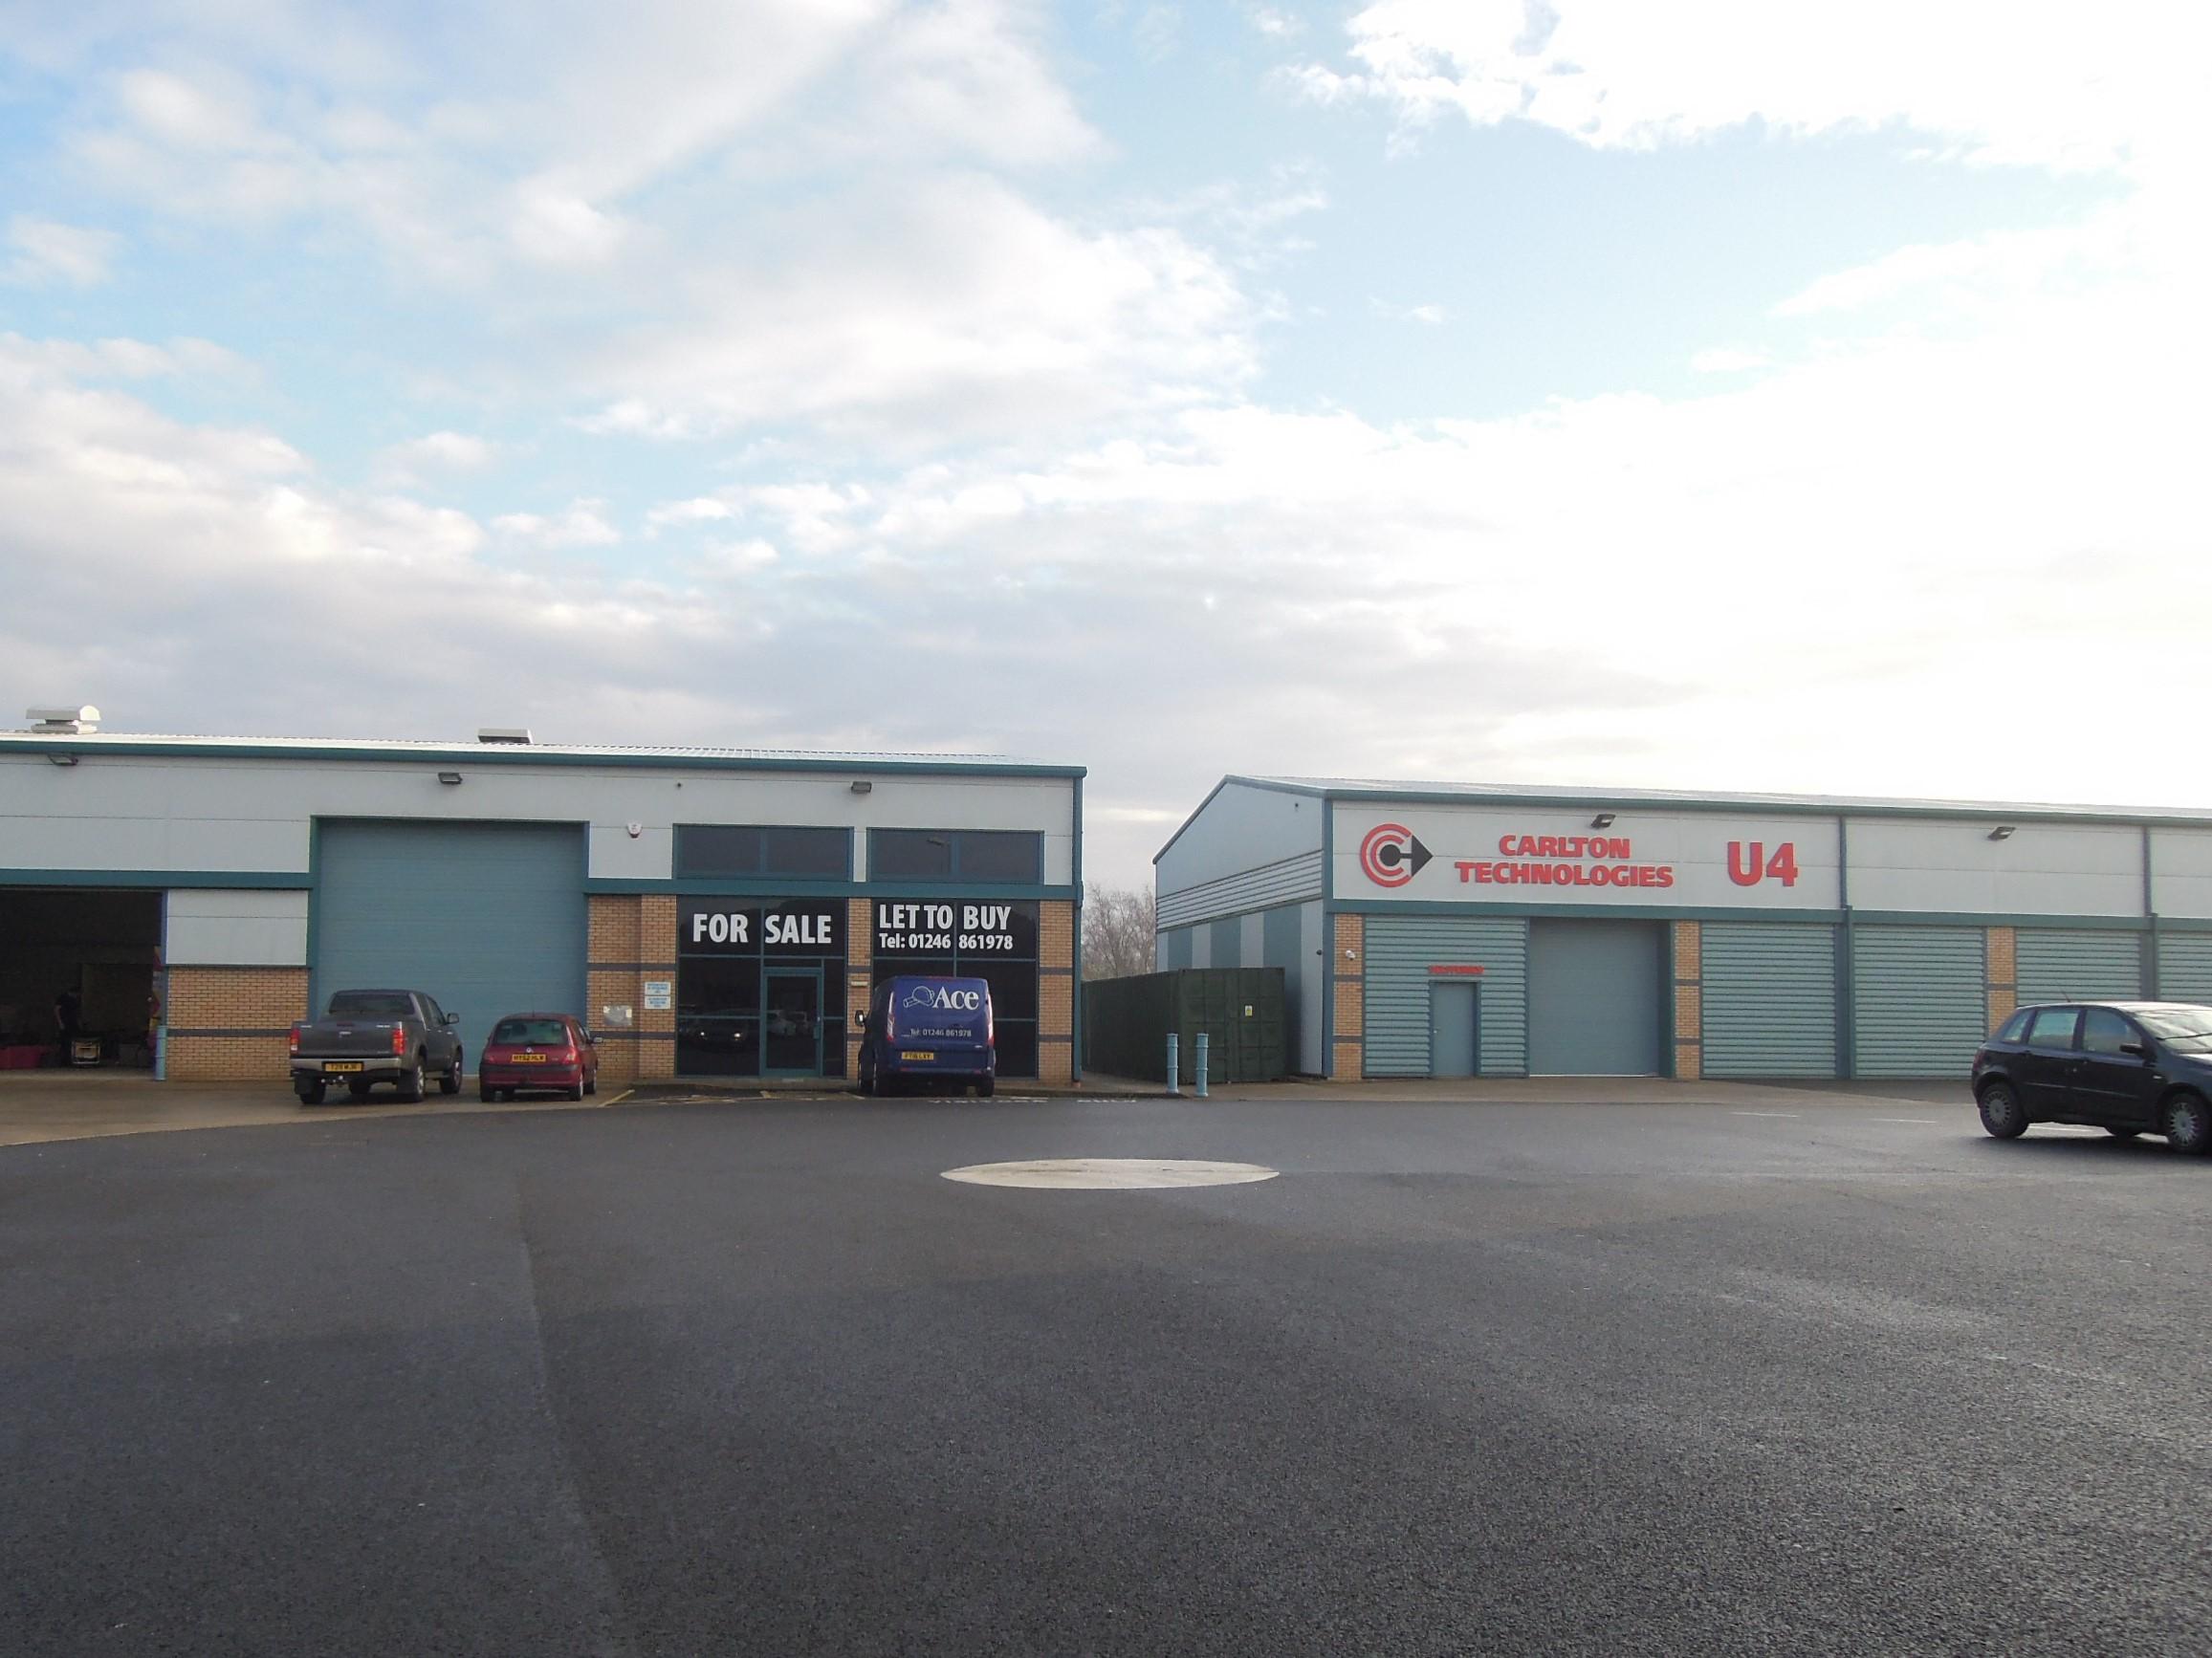 Employment Sites Study, North East Derbyshire